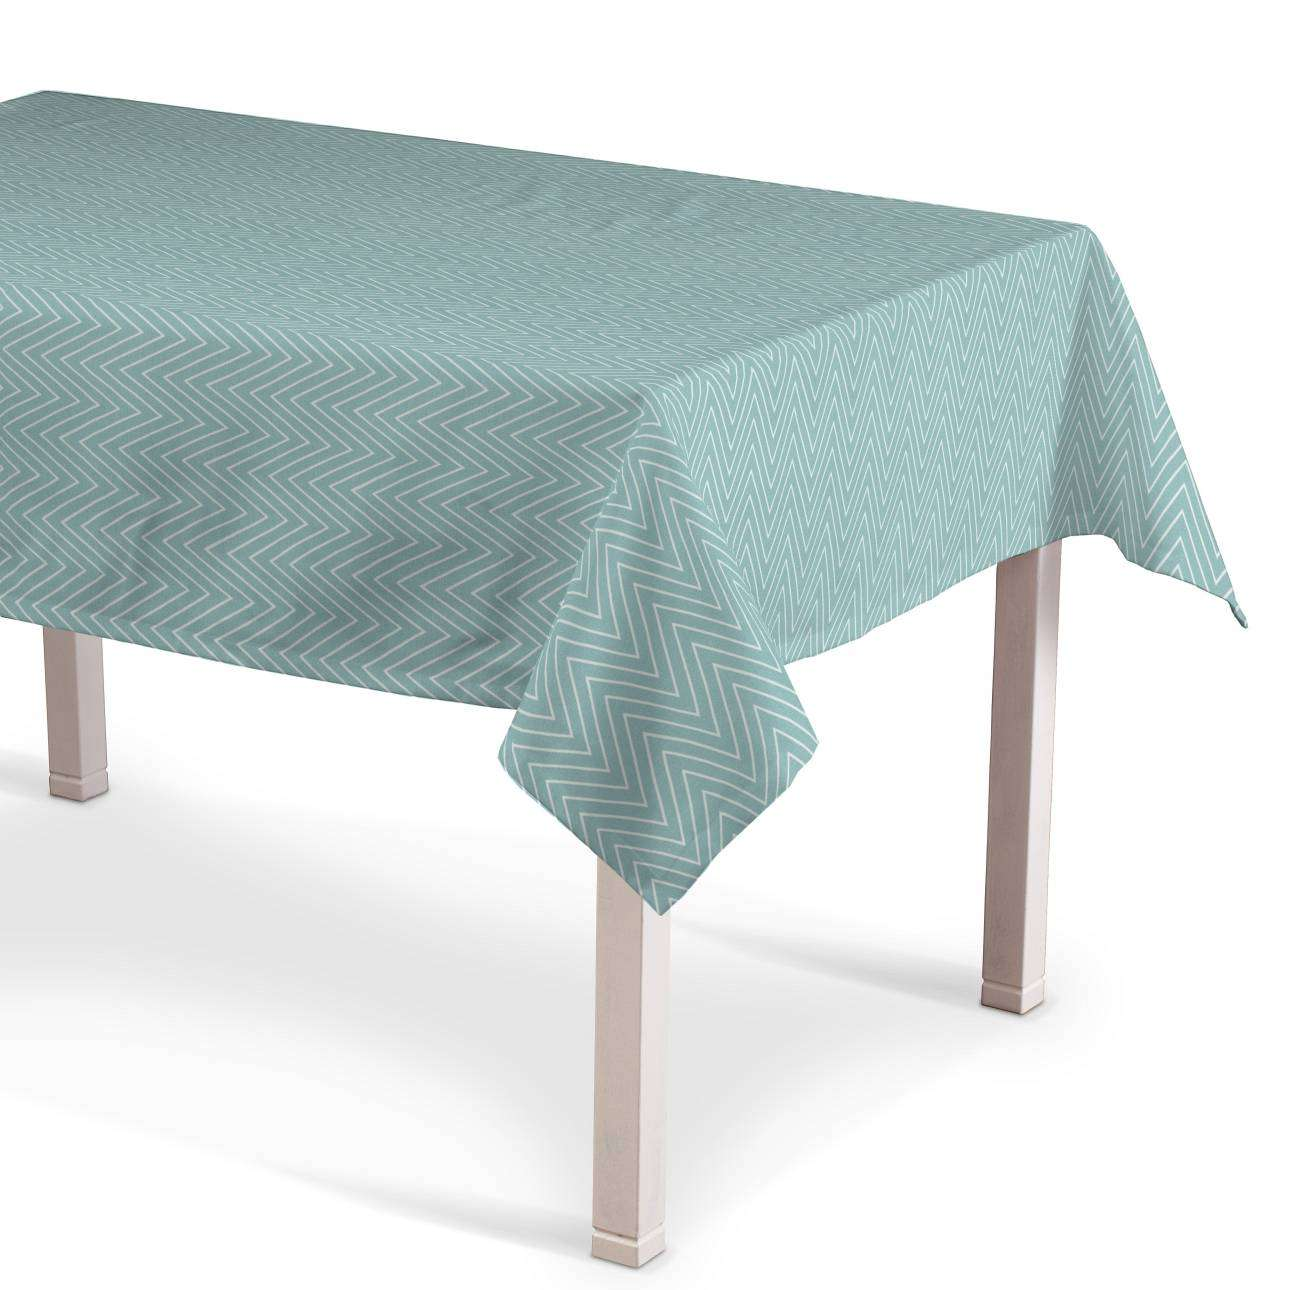 Rektangulære borddug fra kollektionen Brooklyn, Stof: 137-90